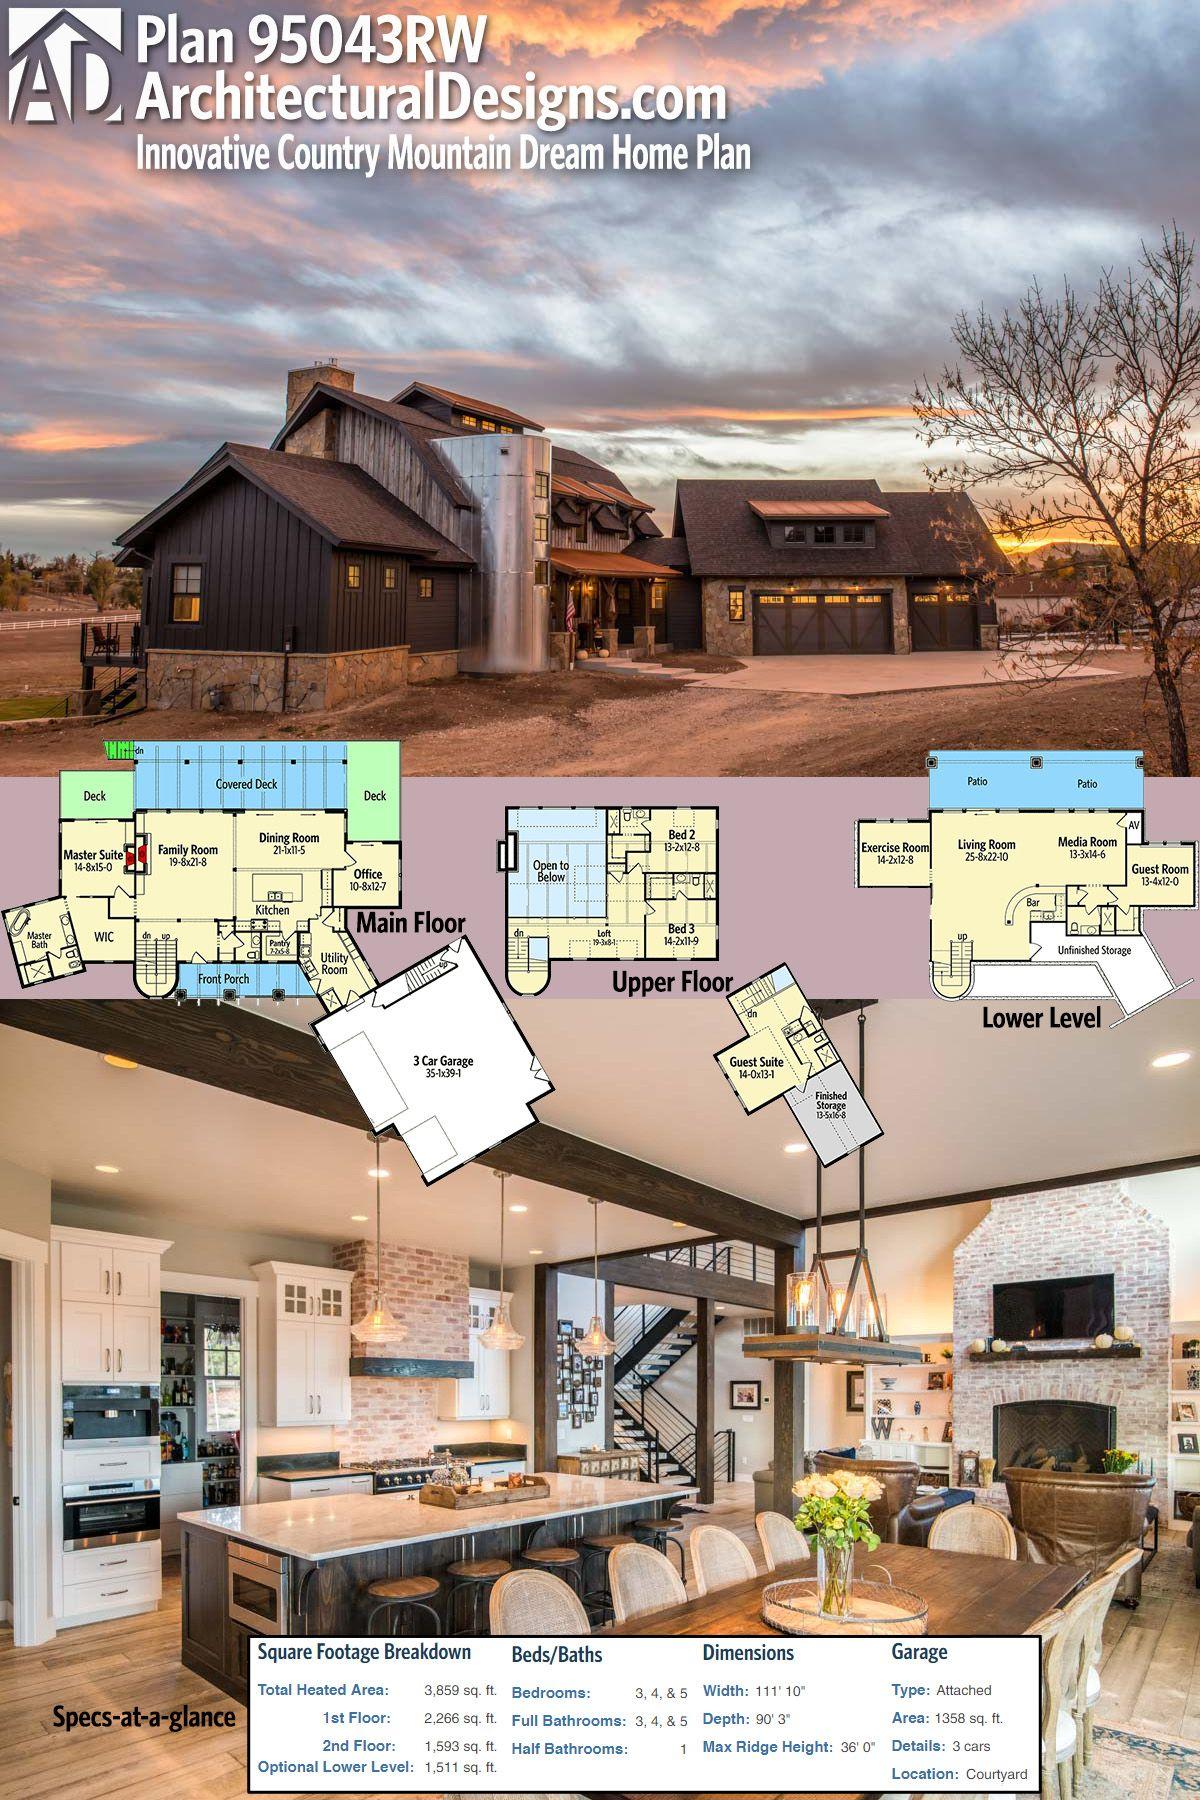 3 bedroom loft house  Plan RW Innovative Country Mountain Dream Home Plan